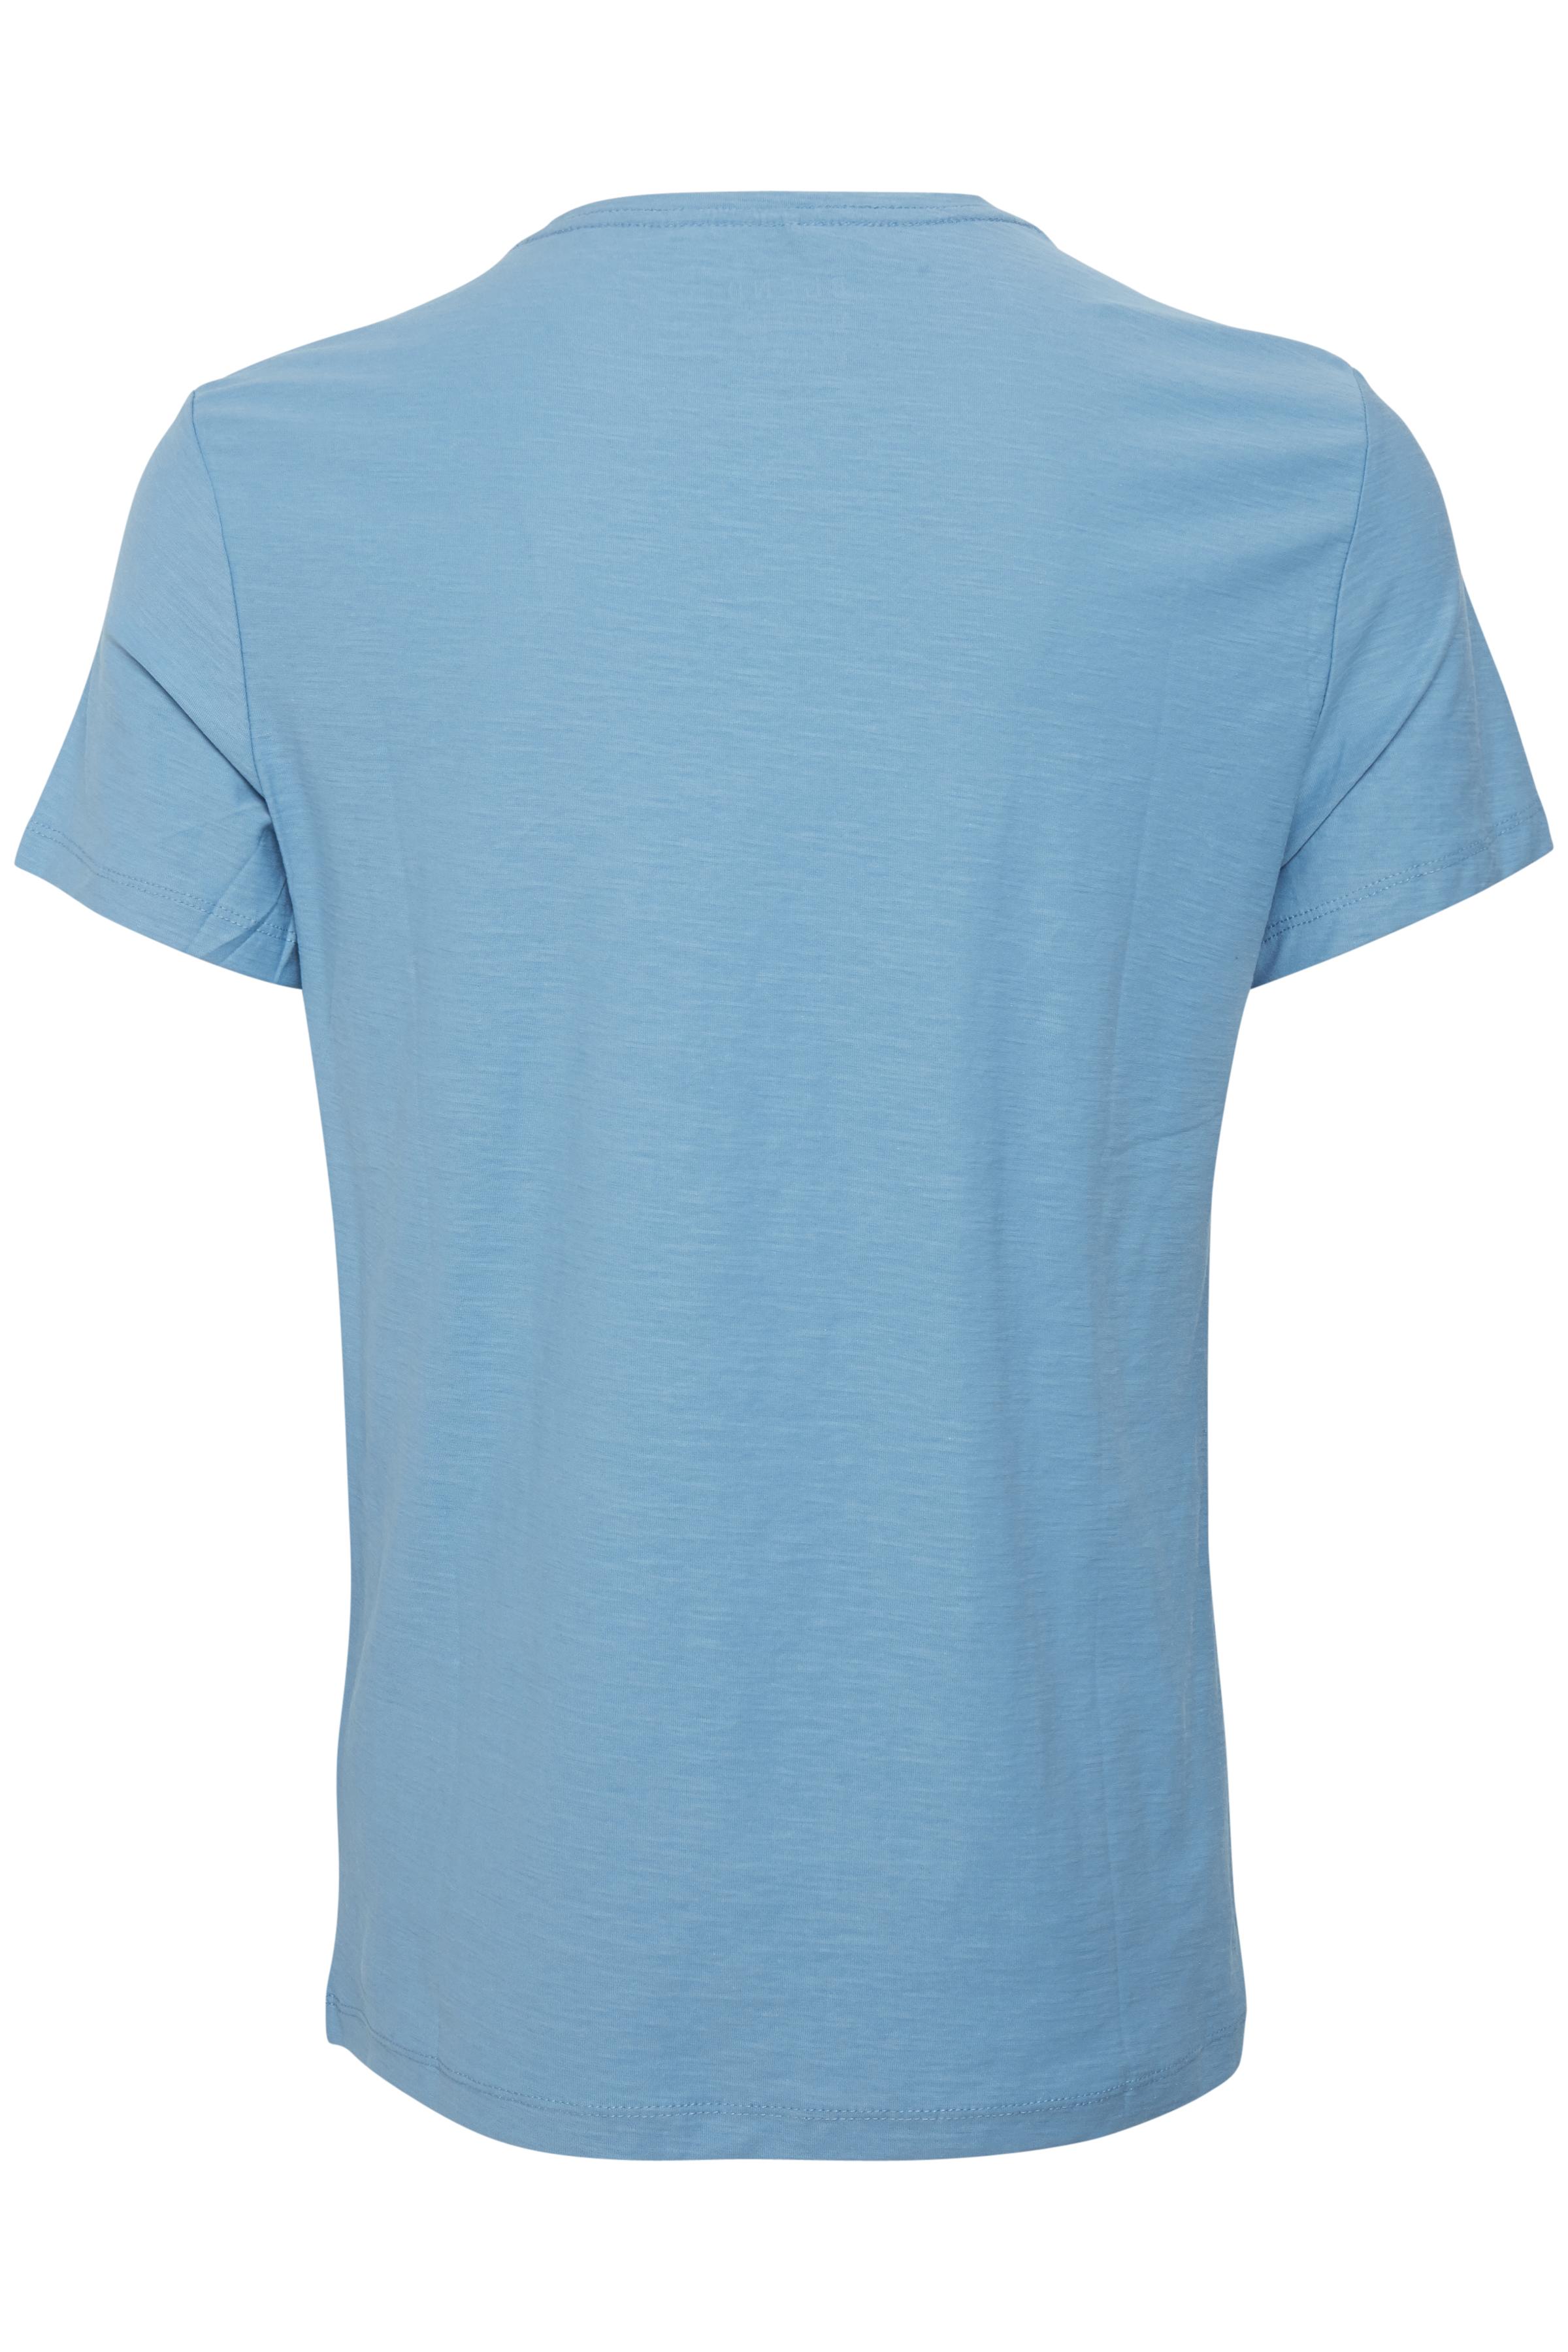 Niagara Blue T-shirt – Køb Niagara Blue T-shirt fra str. M-XXL her